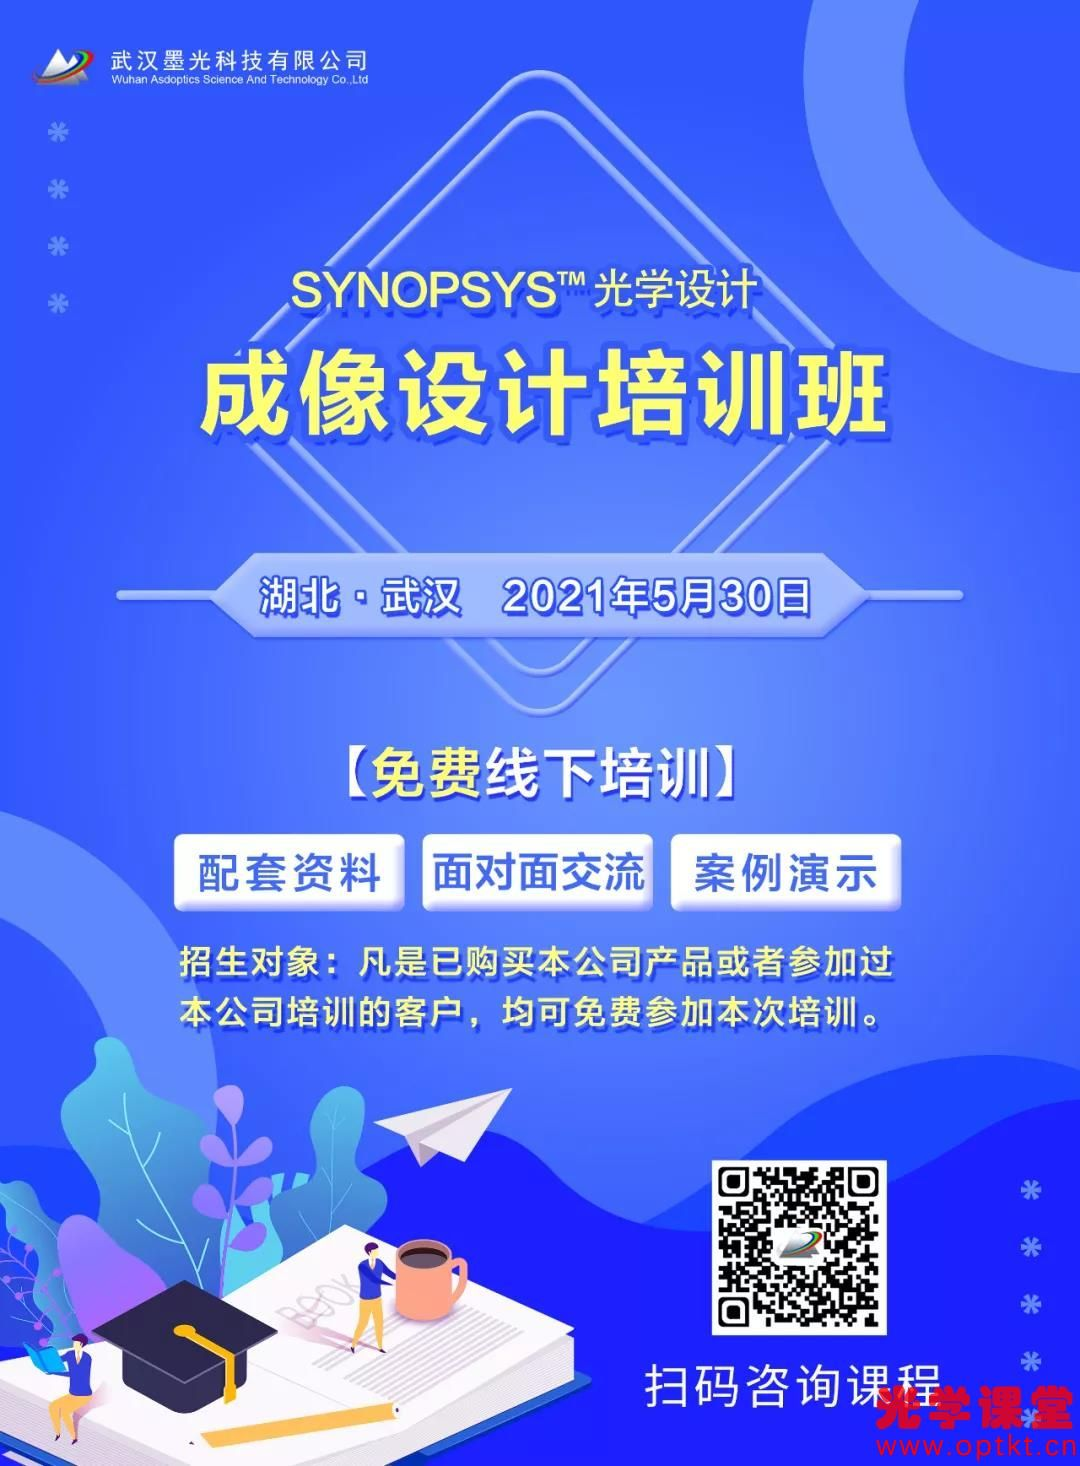 SYNOPSYS-2021-5-20.jpg